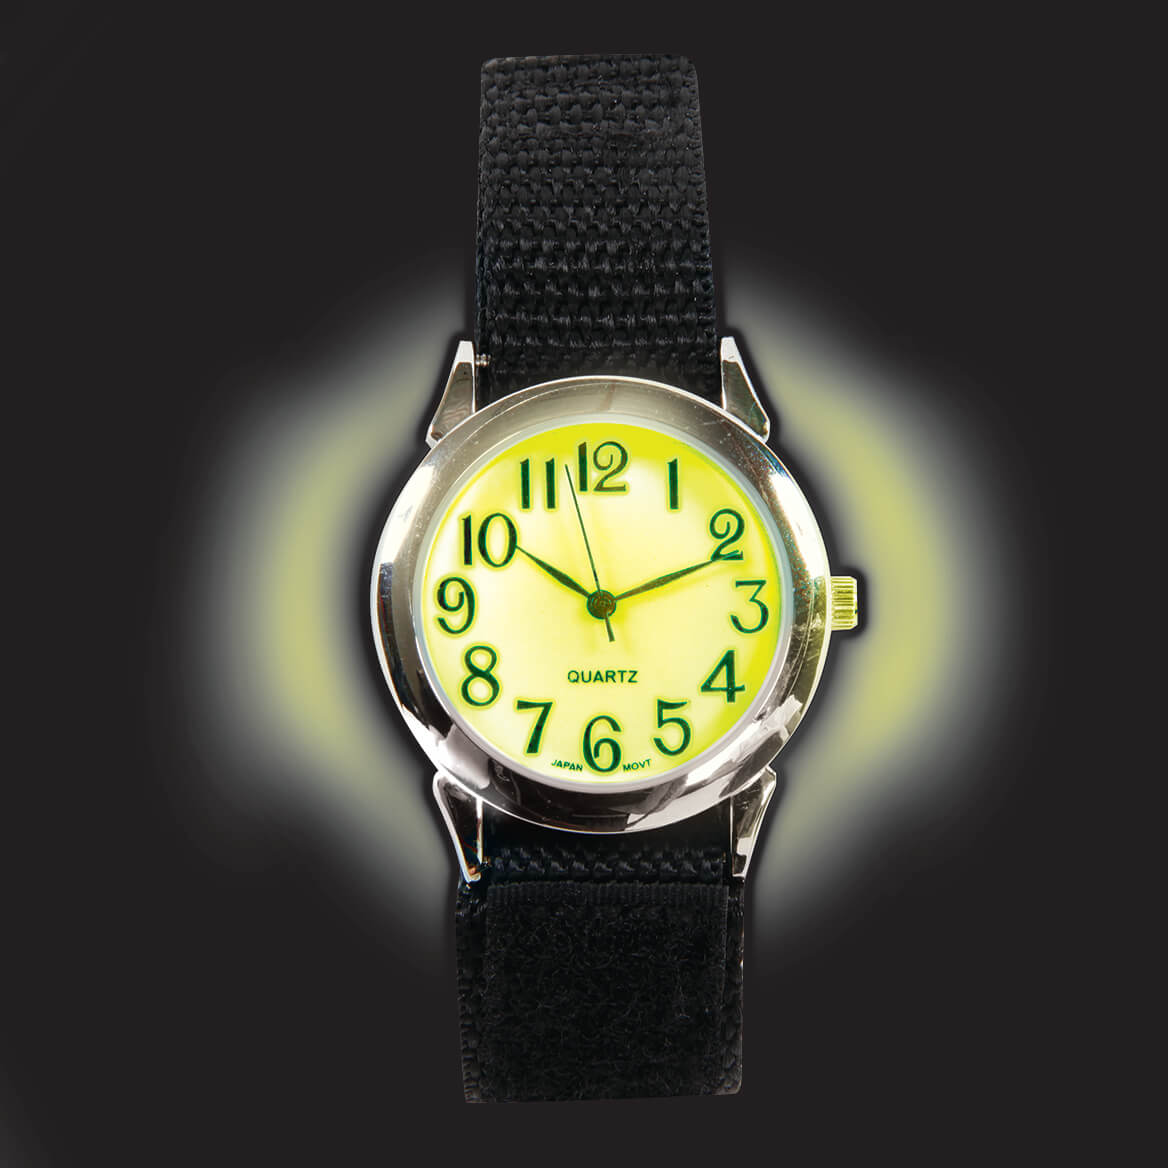 Glow in the Dark Watch Narrow Band-369333